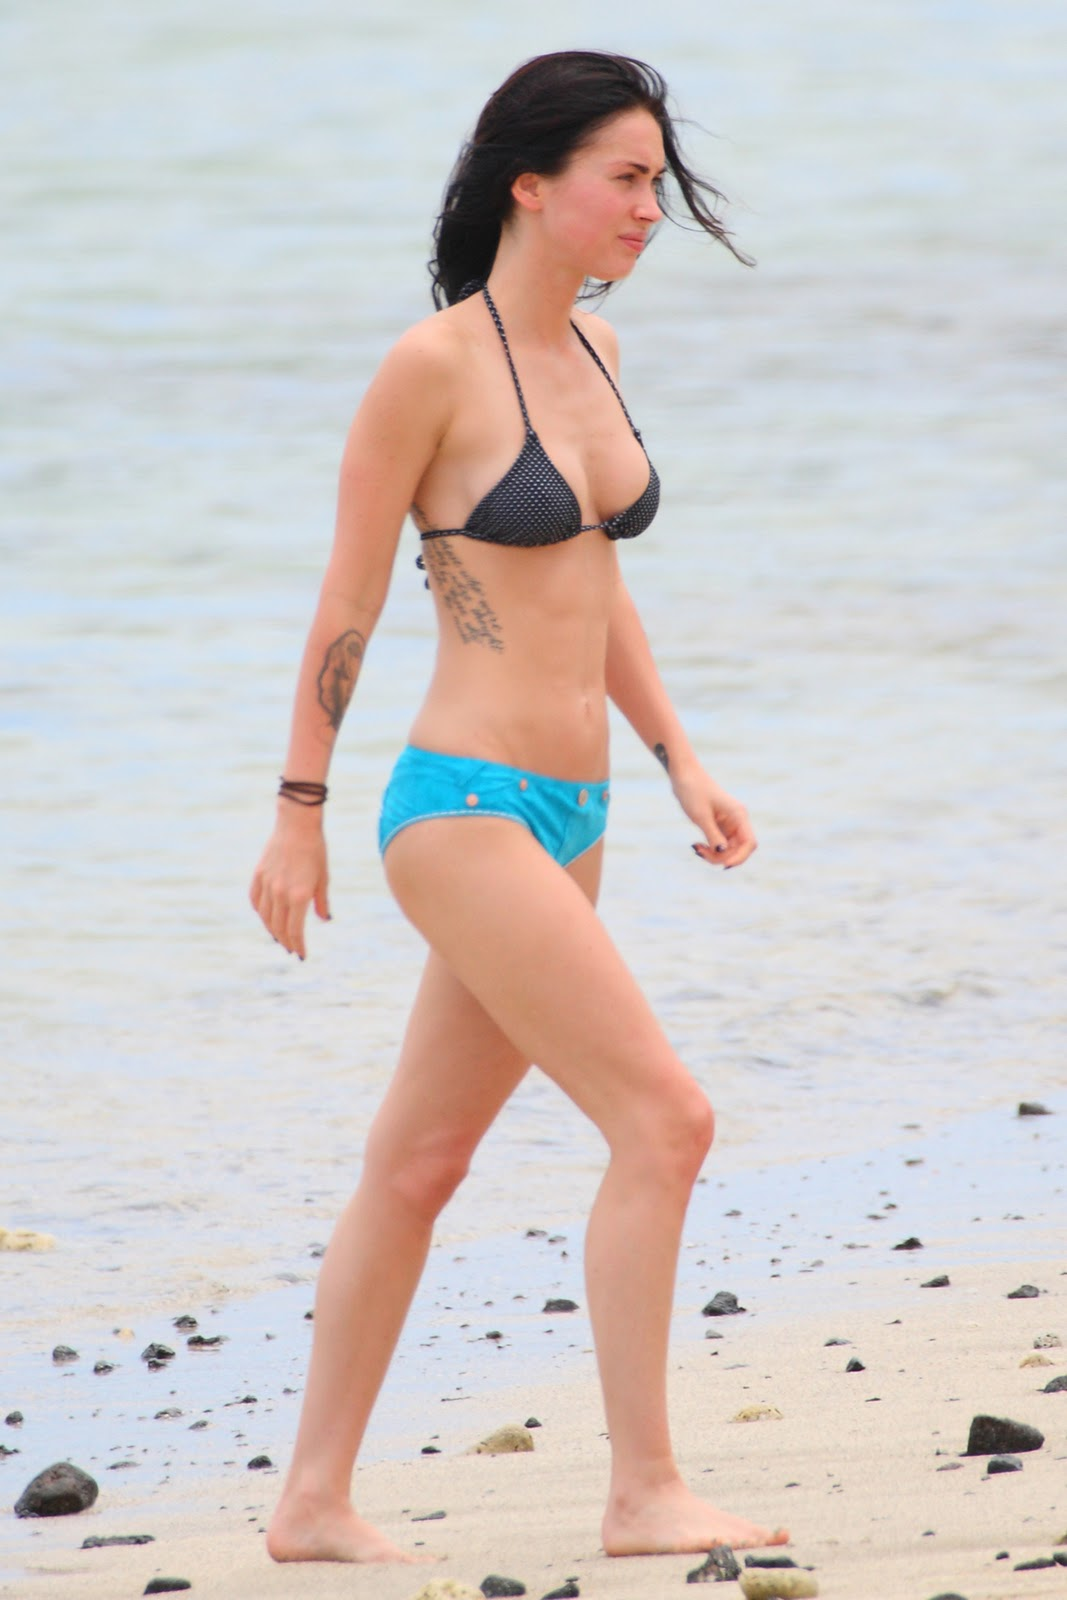 http://3.bp.blogspot.com/-k7YbhoK5Lro/TcTs2yXbR8I/AAAAAAAAAig/YdLxJ3lcYPI/s1600/Megan-Fox-bikini_pics.jpg